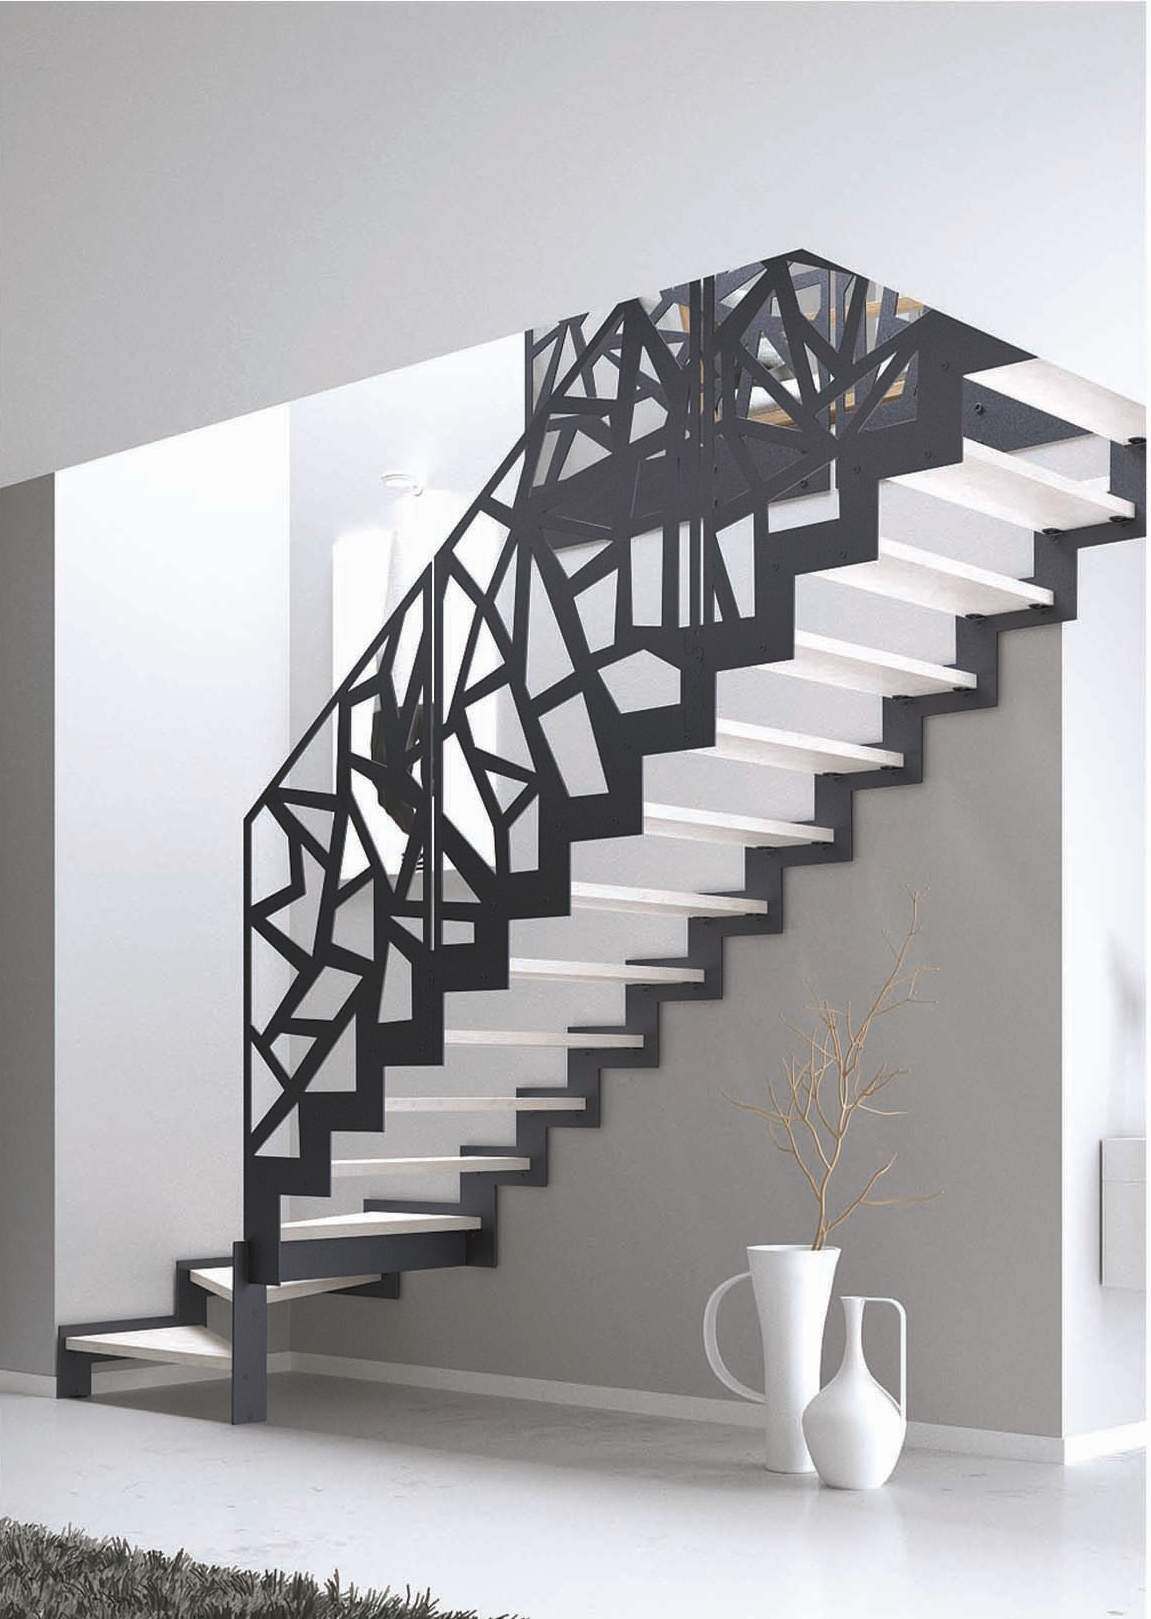 scara interioara contemporana cu balustrada metalica design decorativ